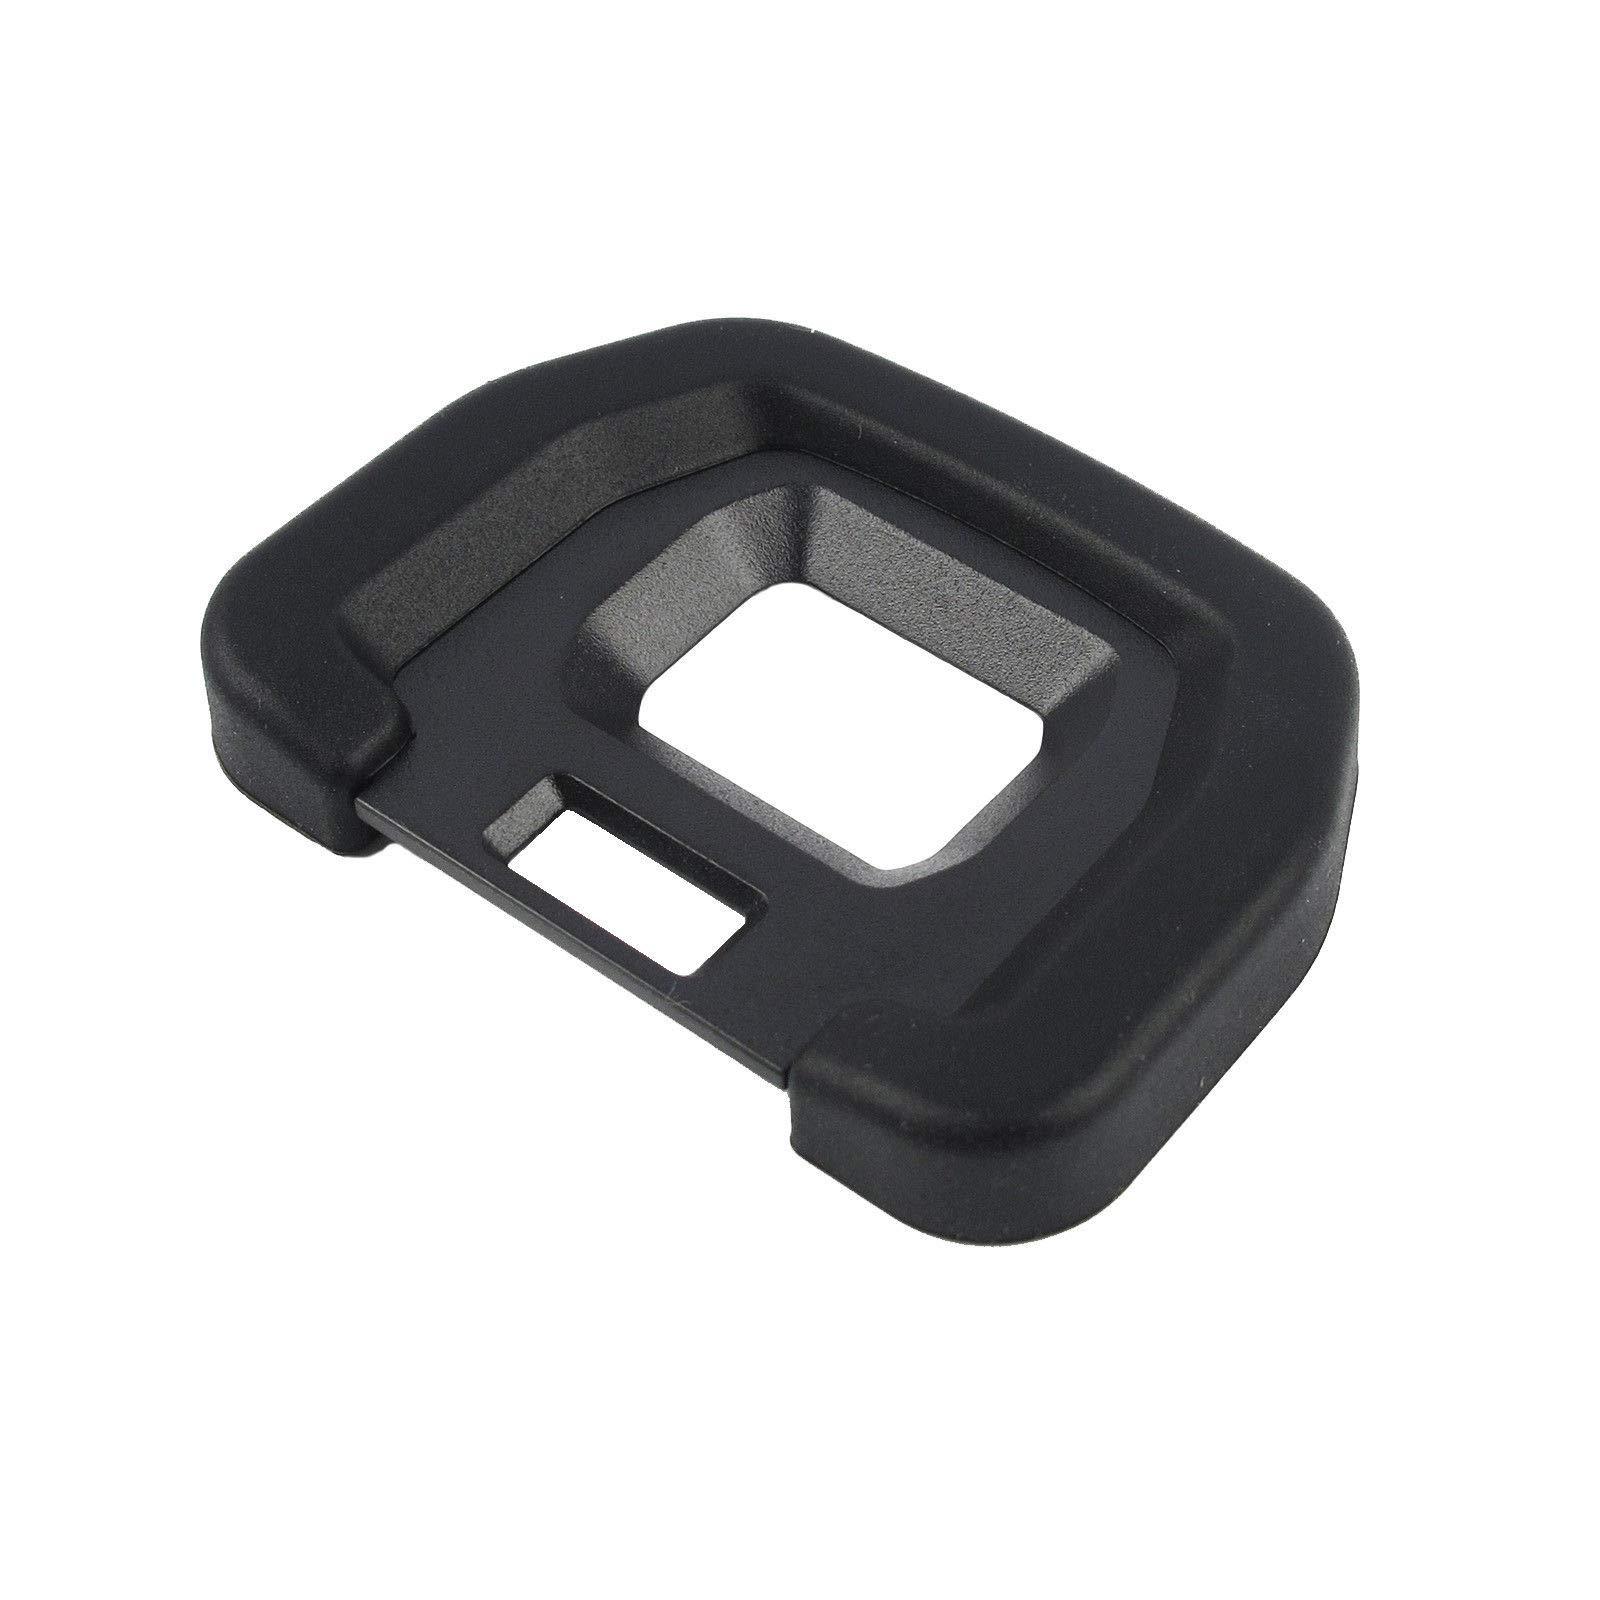 New Eye Cup Viewfinder Eyepiece Shell for Panasonic Lumix DMC-GH3 GH4 GH3 Camera